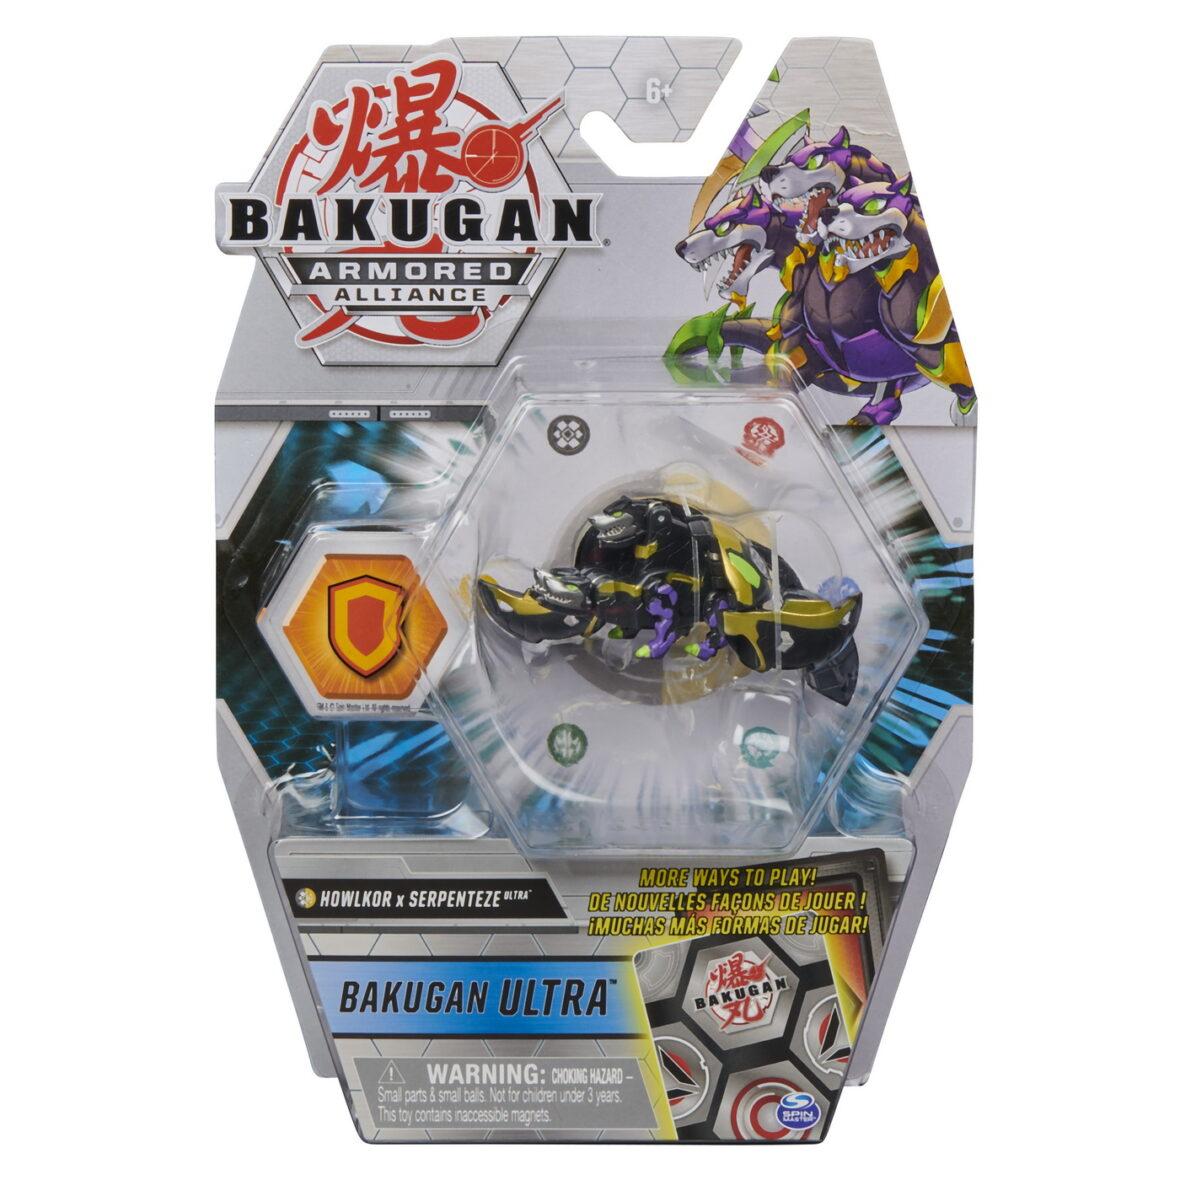 Bakugan S2 Bila Ultra Howlkor Serpenteze Cu Card Baku-gear